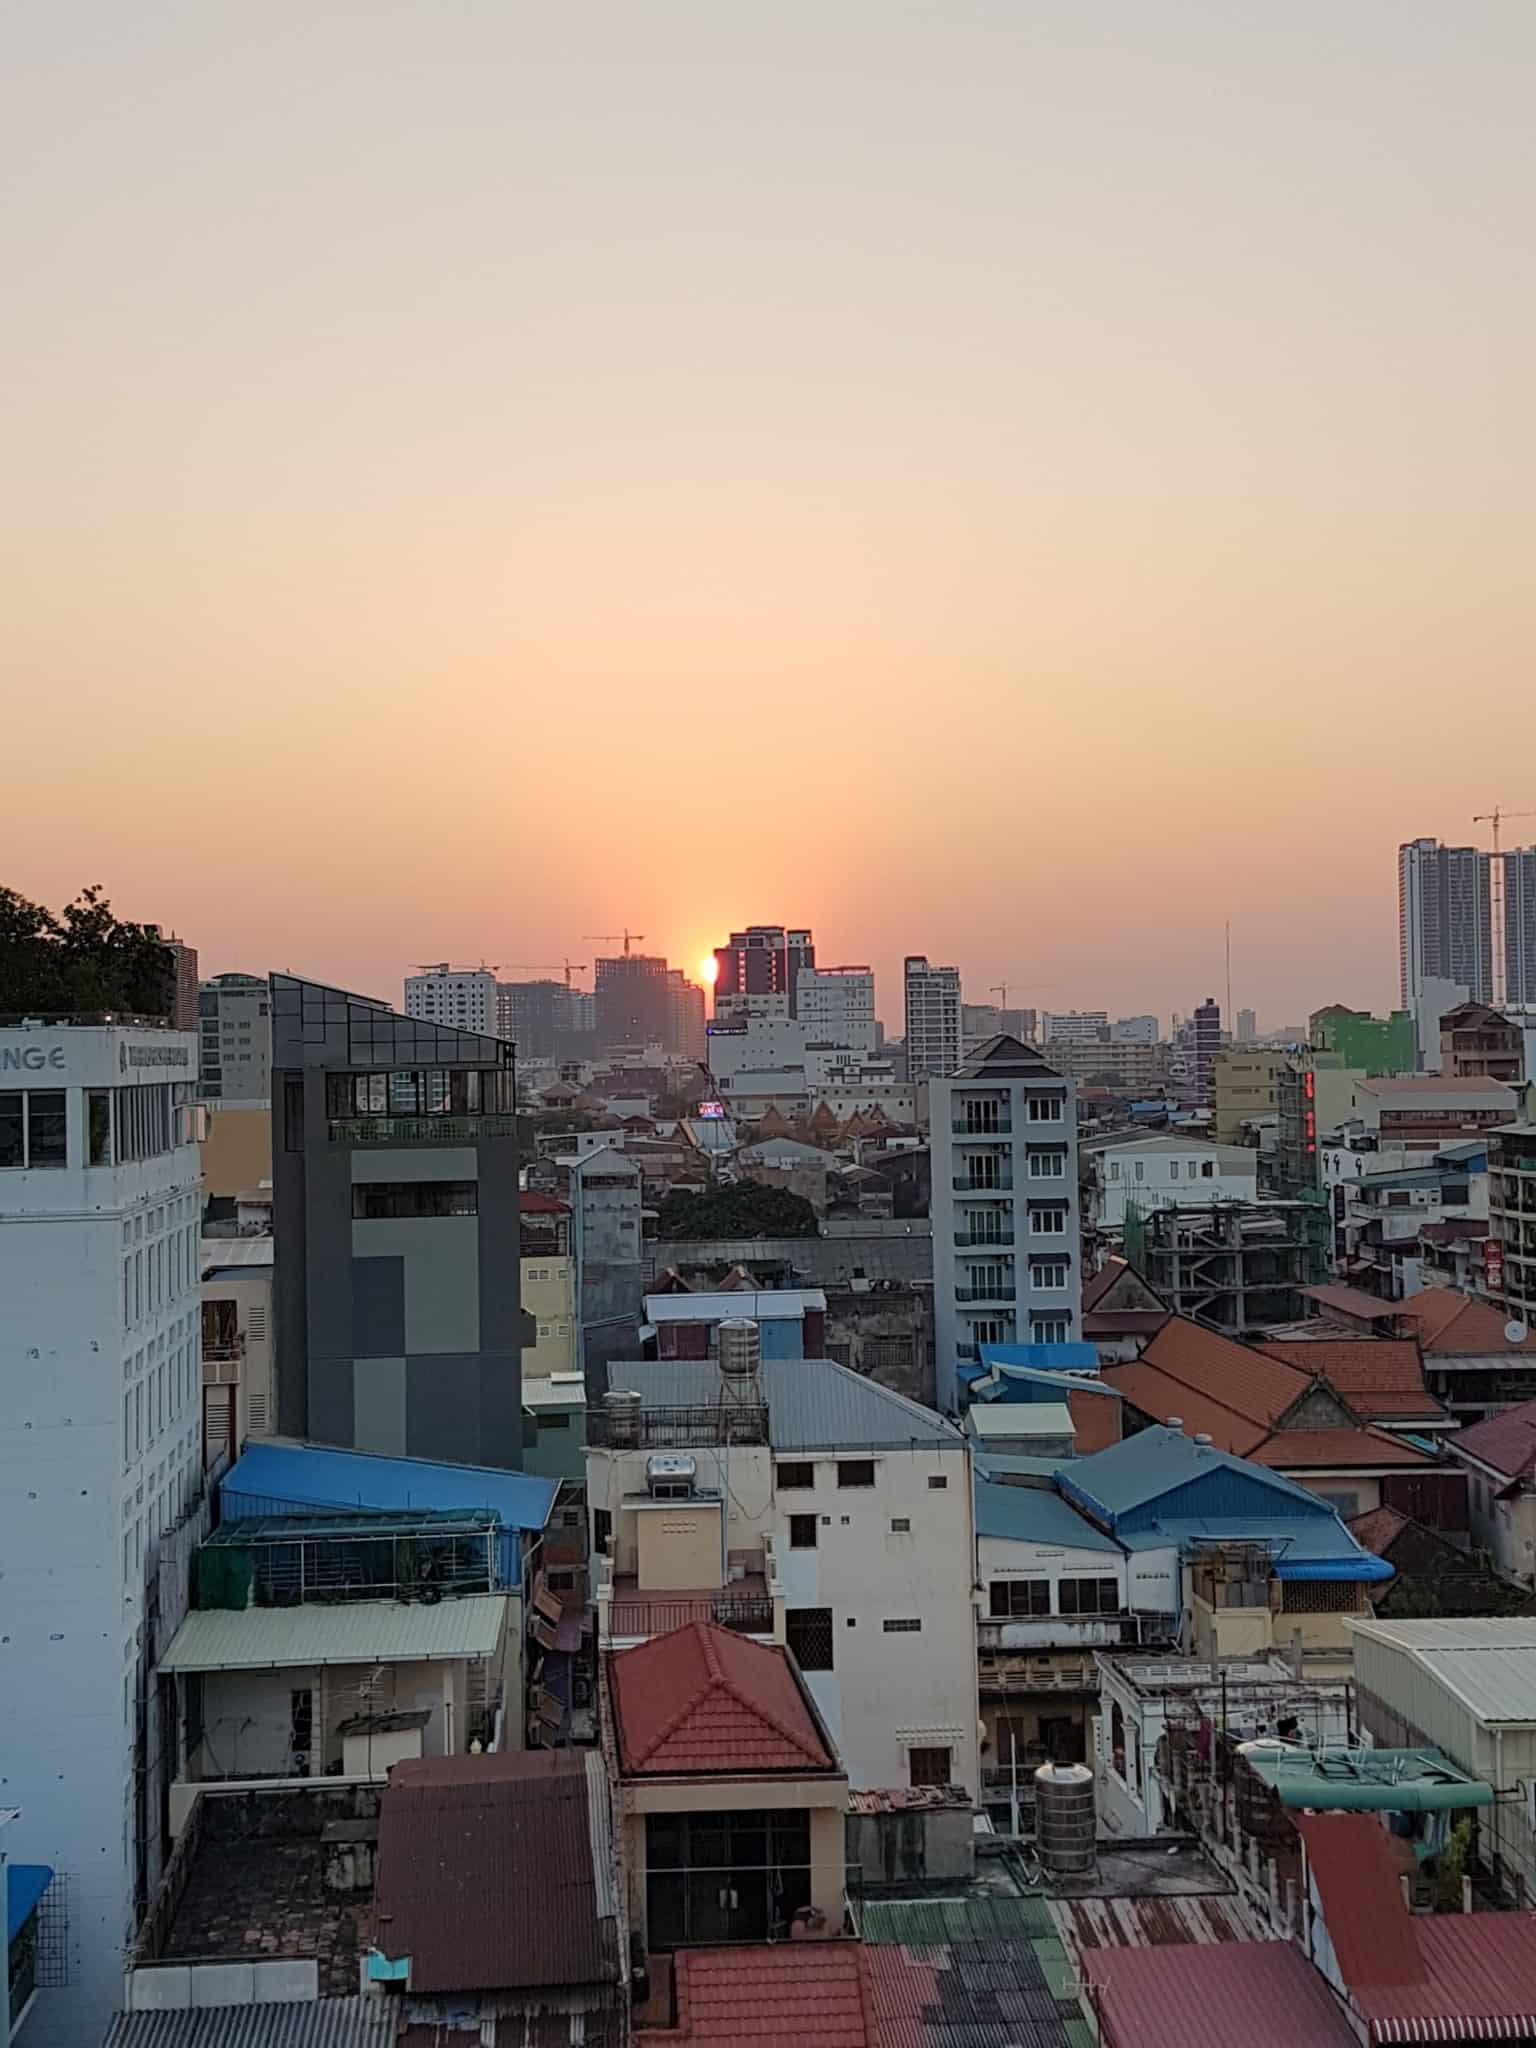 Cambodge, premiers pas à Phnom Penh 👟 6